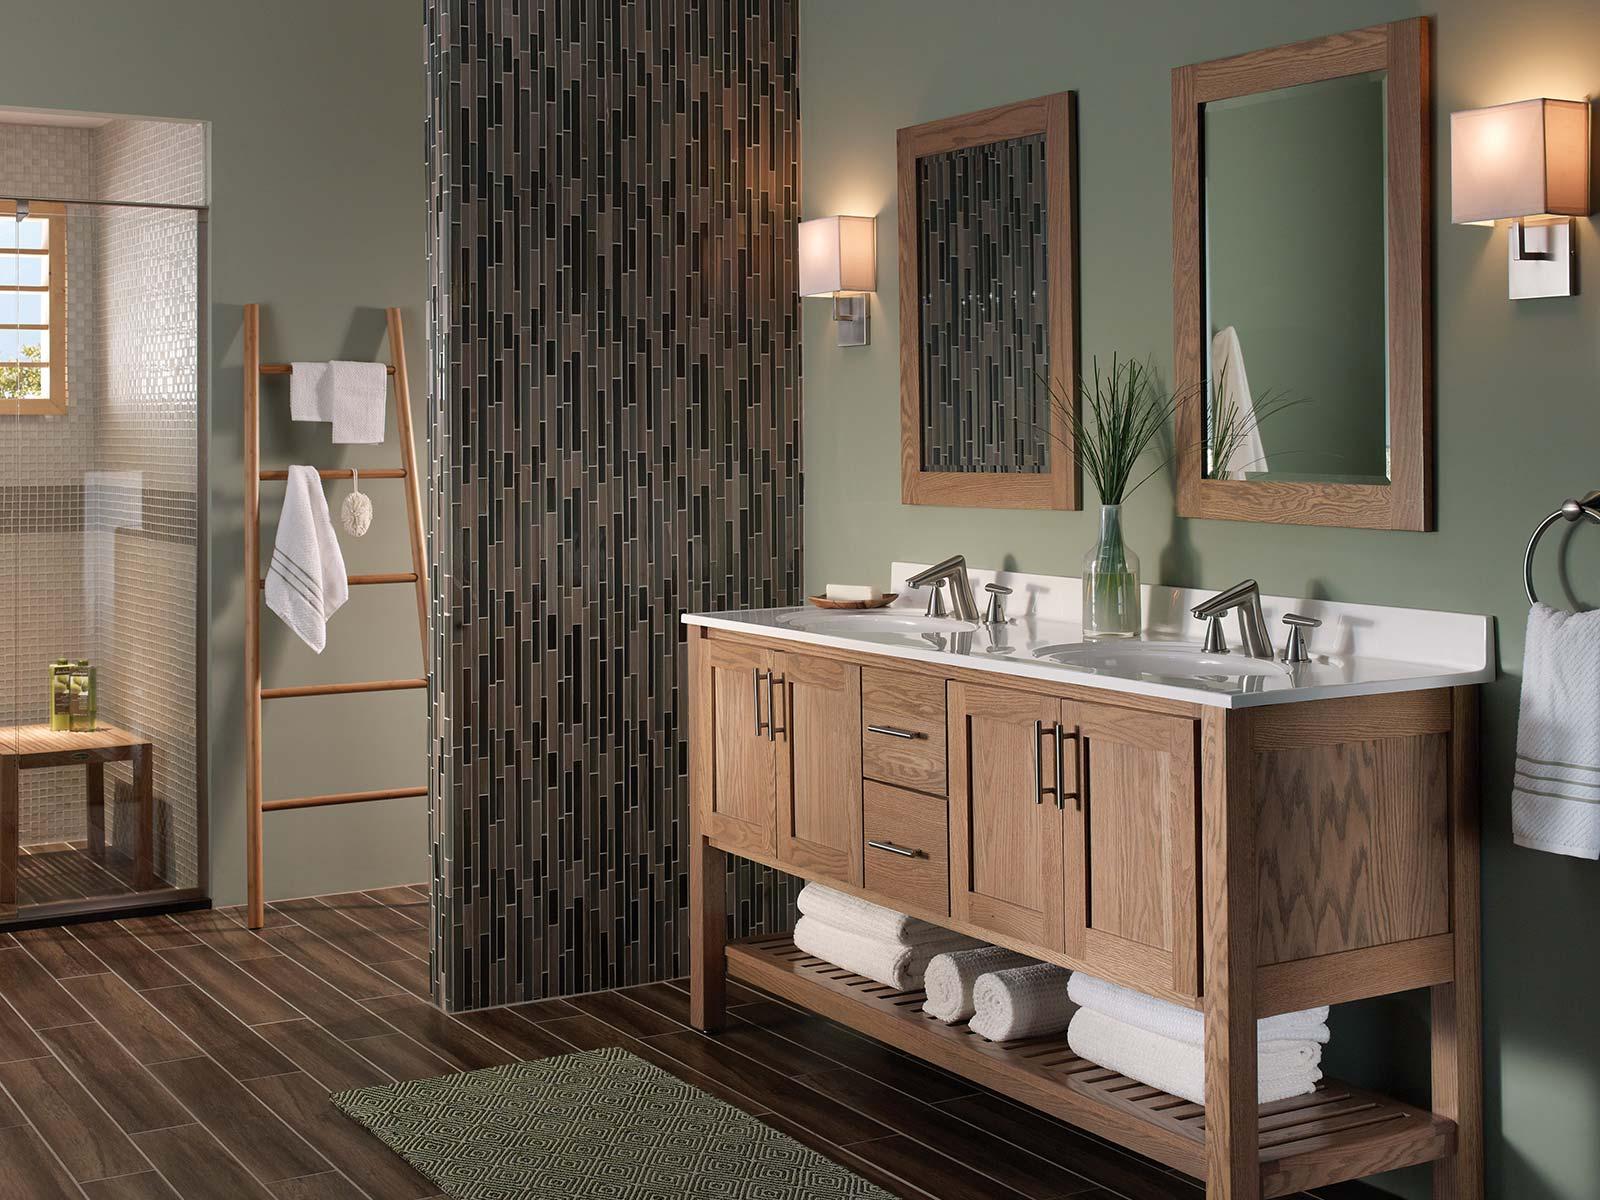 Interlude Driftwood Oak Bertch Cabinets